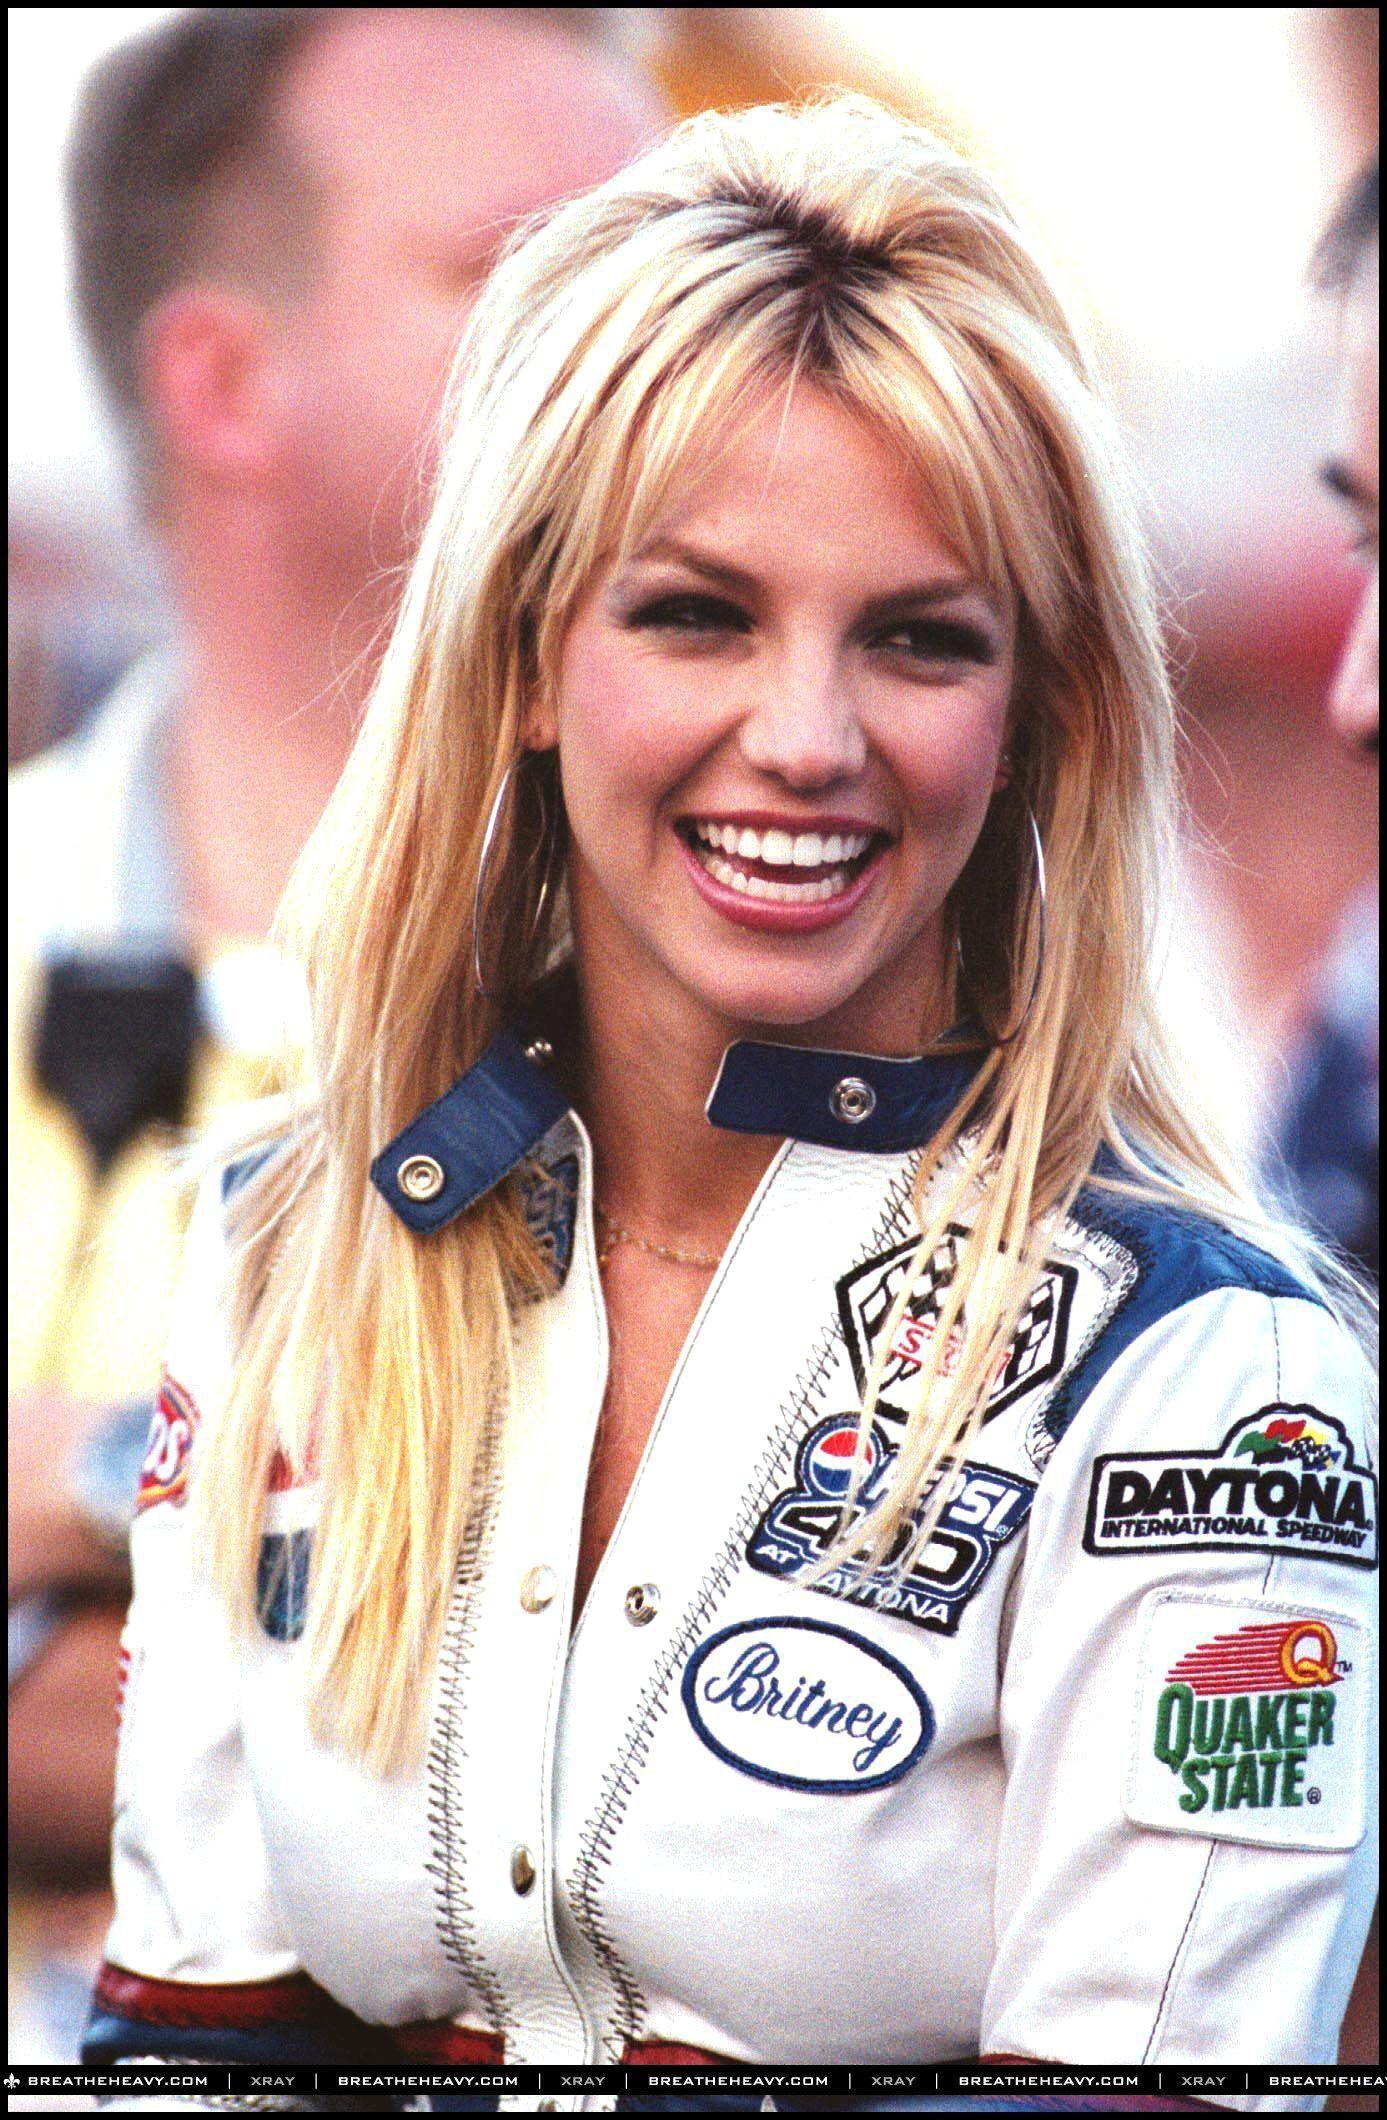 Pepsi Britney Spears 2001